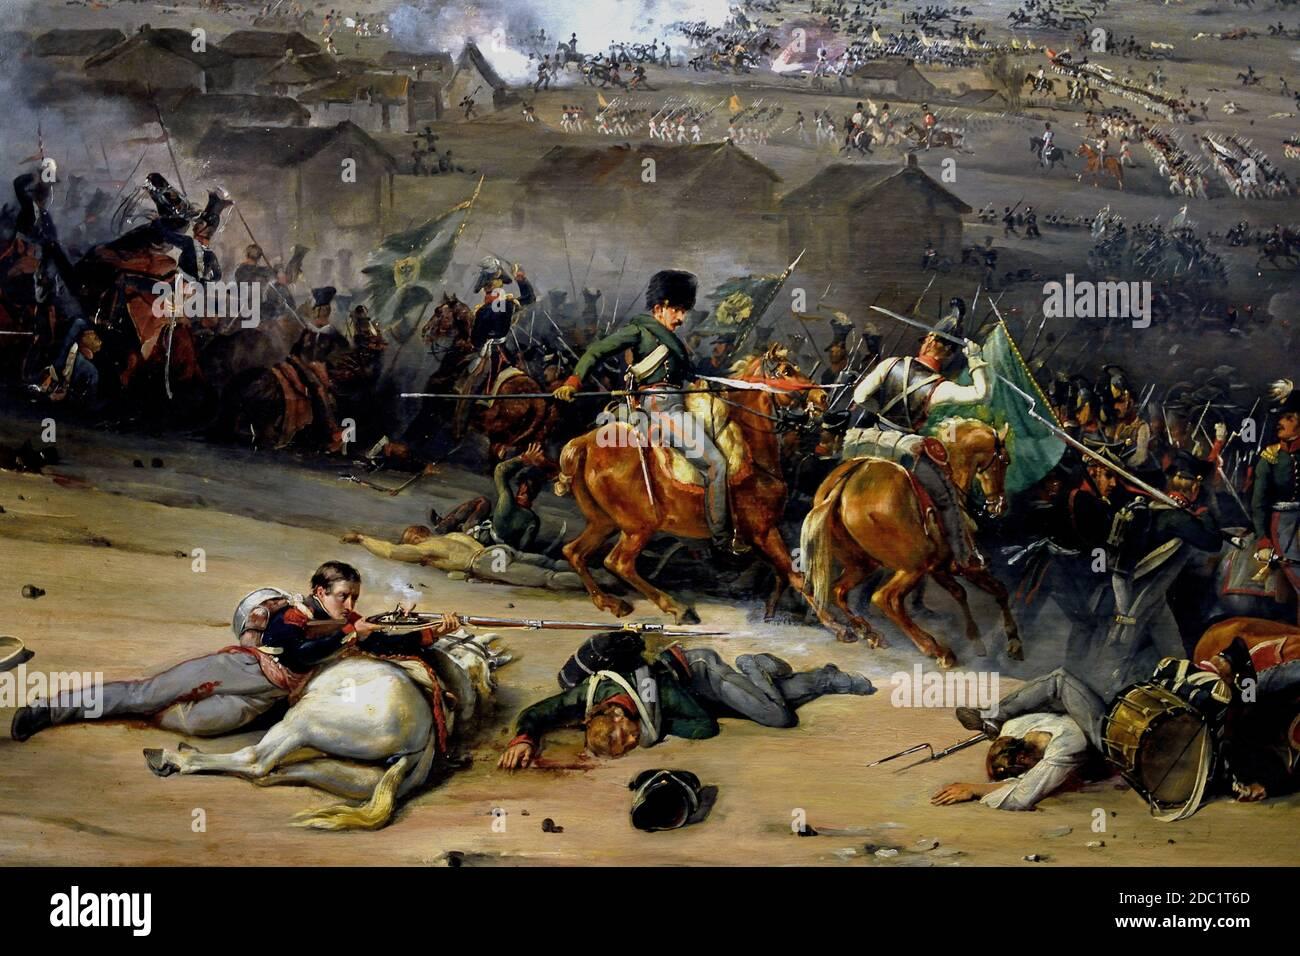 Batalla de Laubressel , parte de la Guerra del Mariscal de campo de la Sexta Coalición Karl Philipp, Príncipe de Schwarzenberg Monte un ataque convergente de tres puntas contra el ejército más débil del Mariscal Jacques MacDonald. Francia, francés. Foto de stock